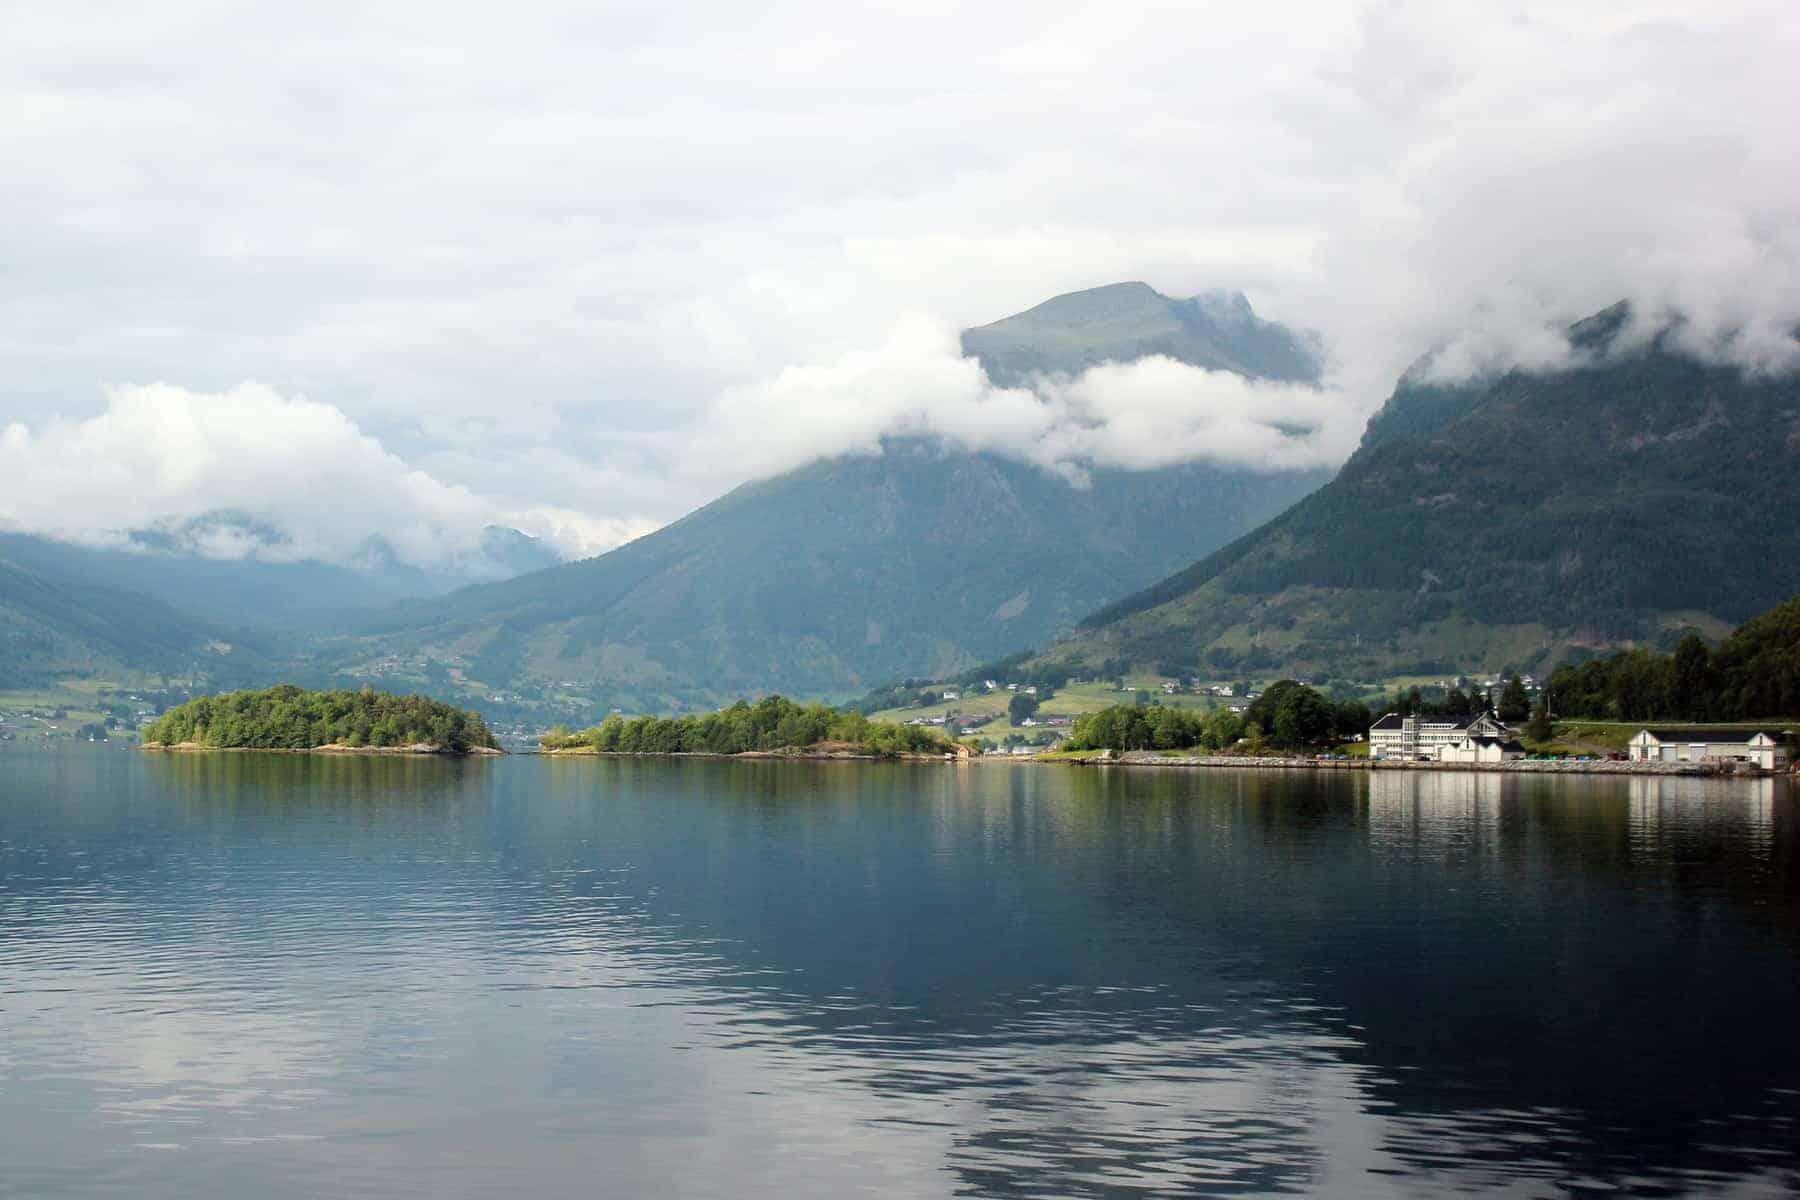 Hardangerfjord, the second longest fjord in Norway.